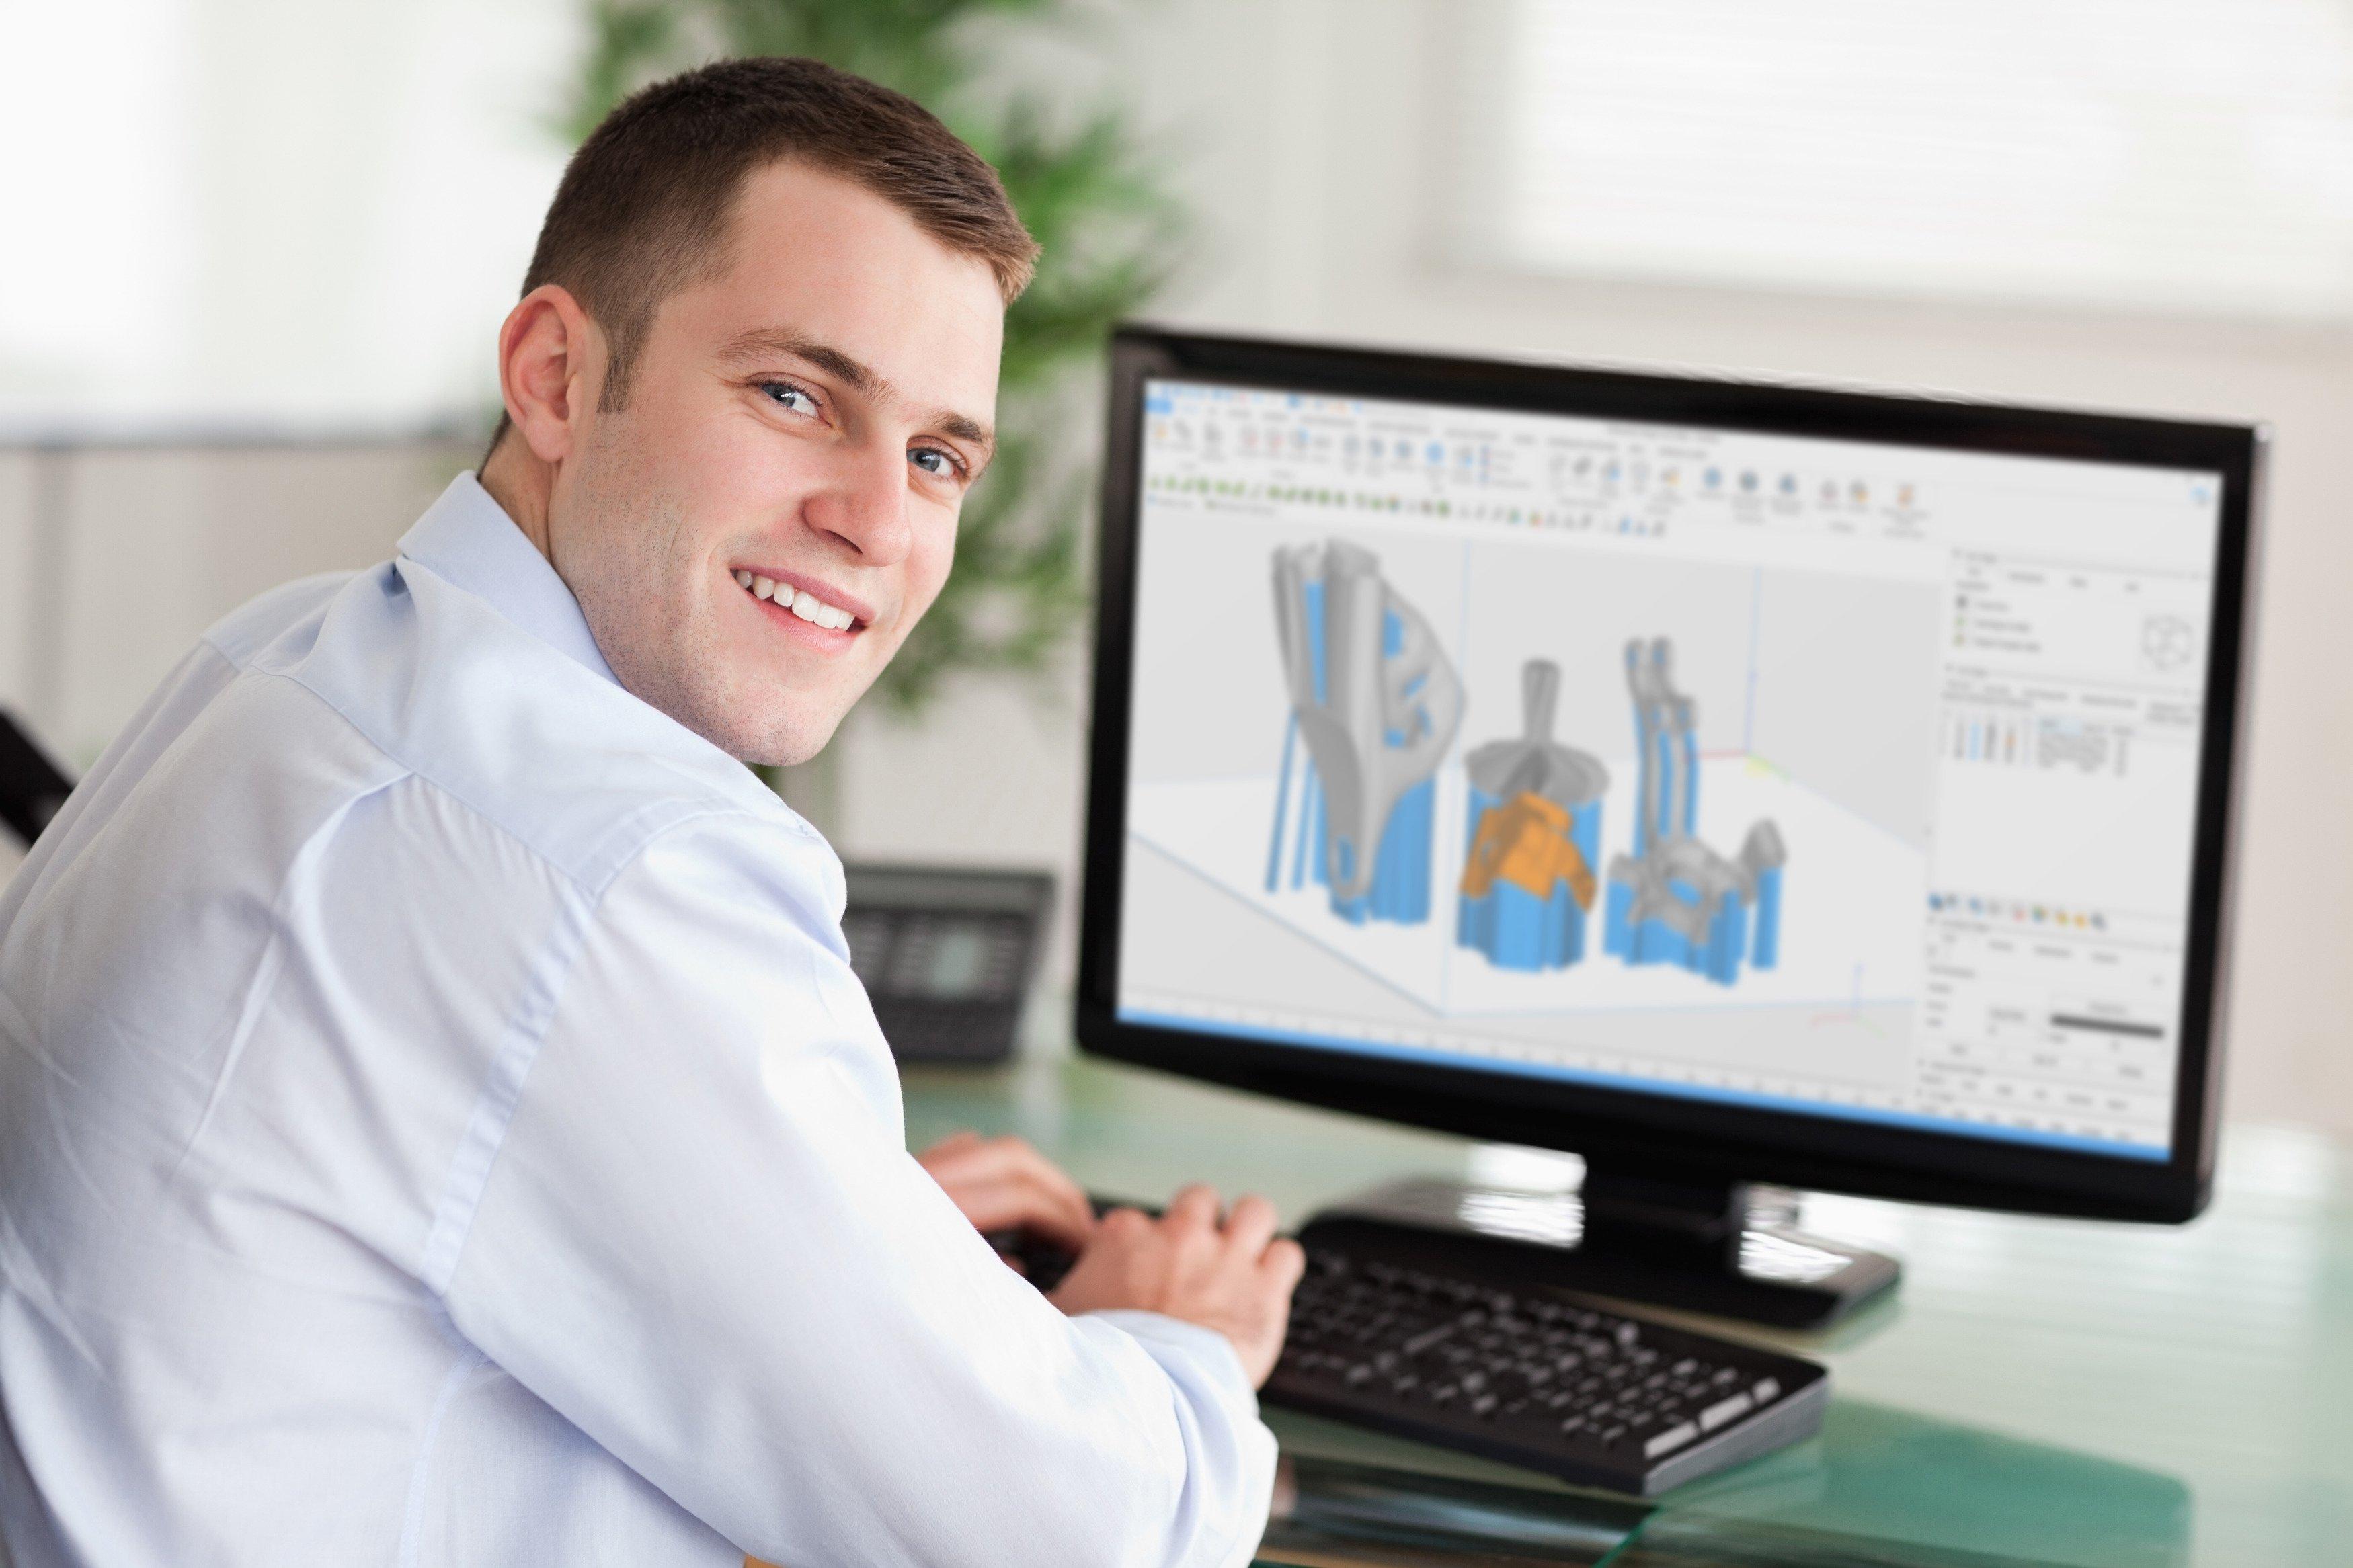 Работа фрилансер инженер-конструктор freelance reporting